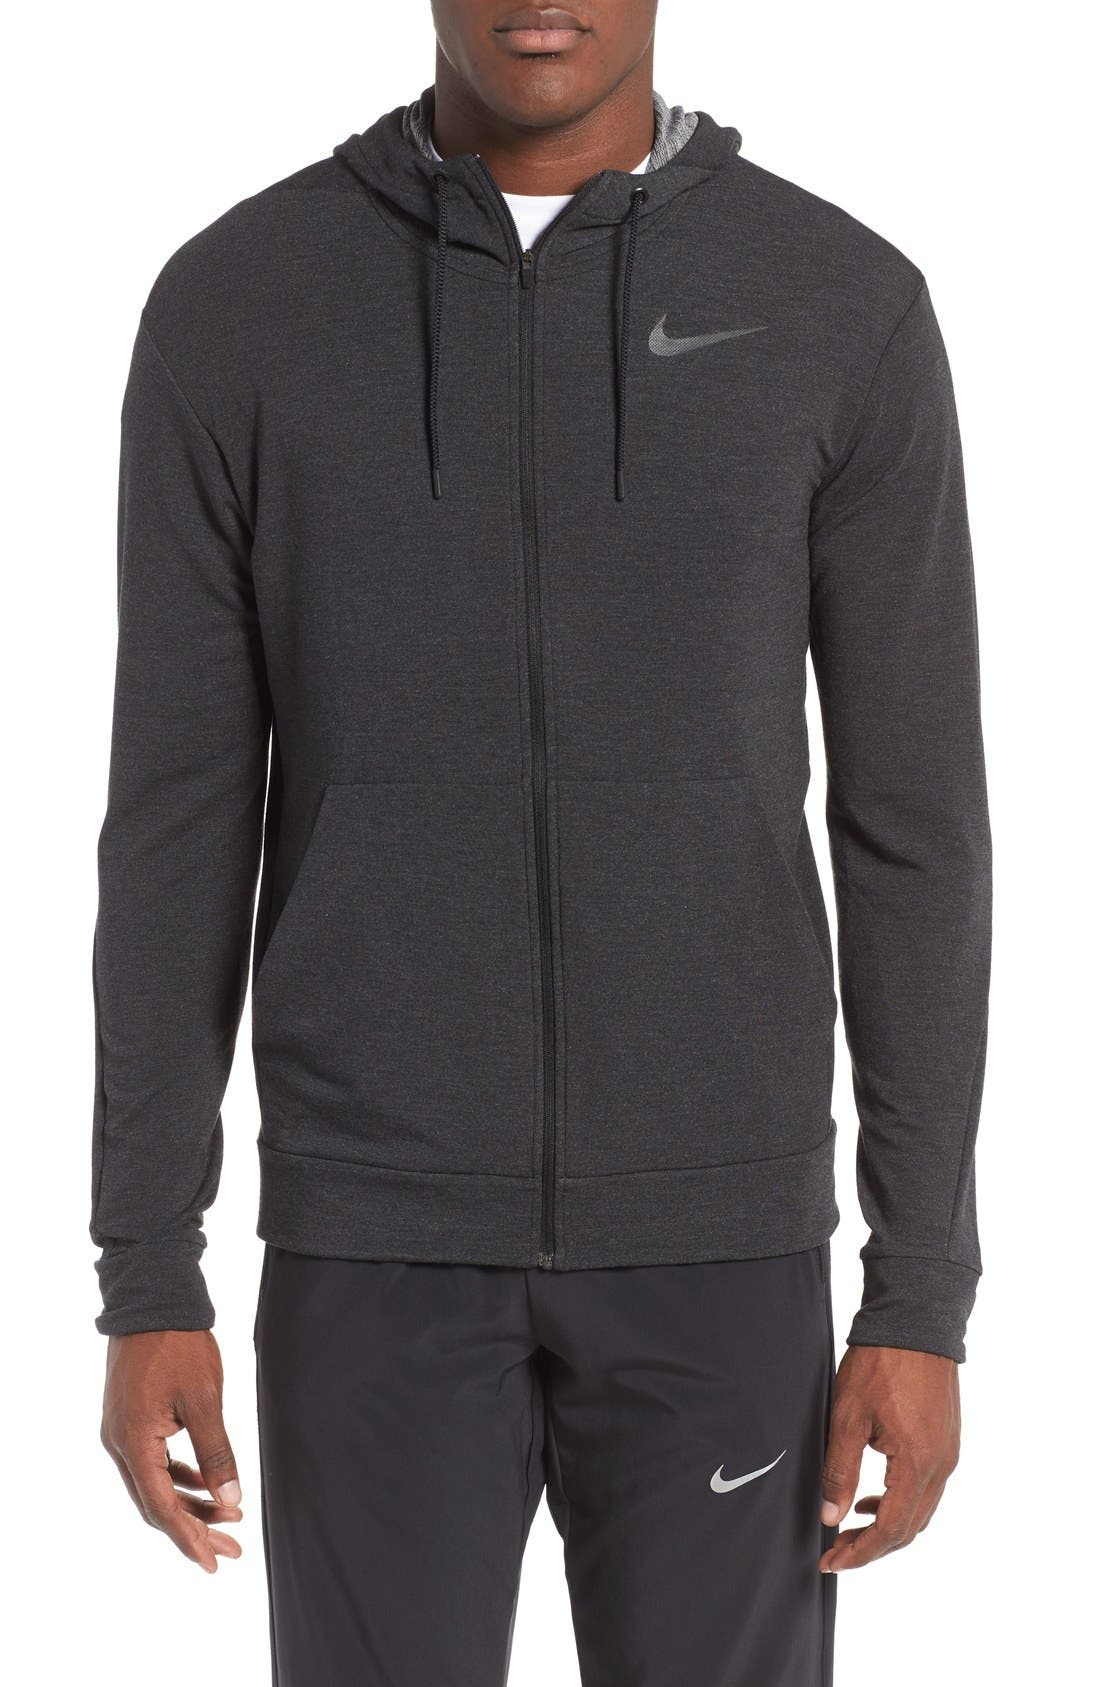 Alternate Image 1 Selected - Nike Dri-Fit Training Fleece Hooded Sweatshirt